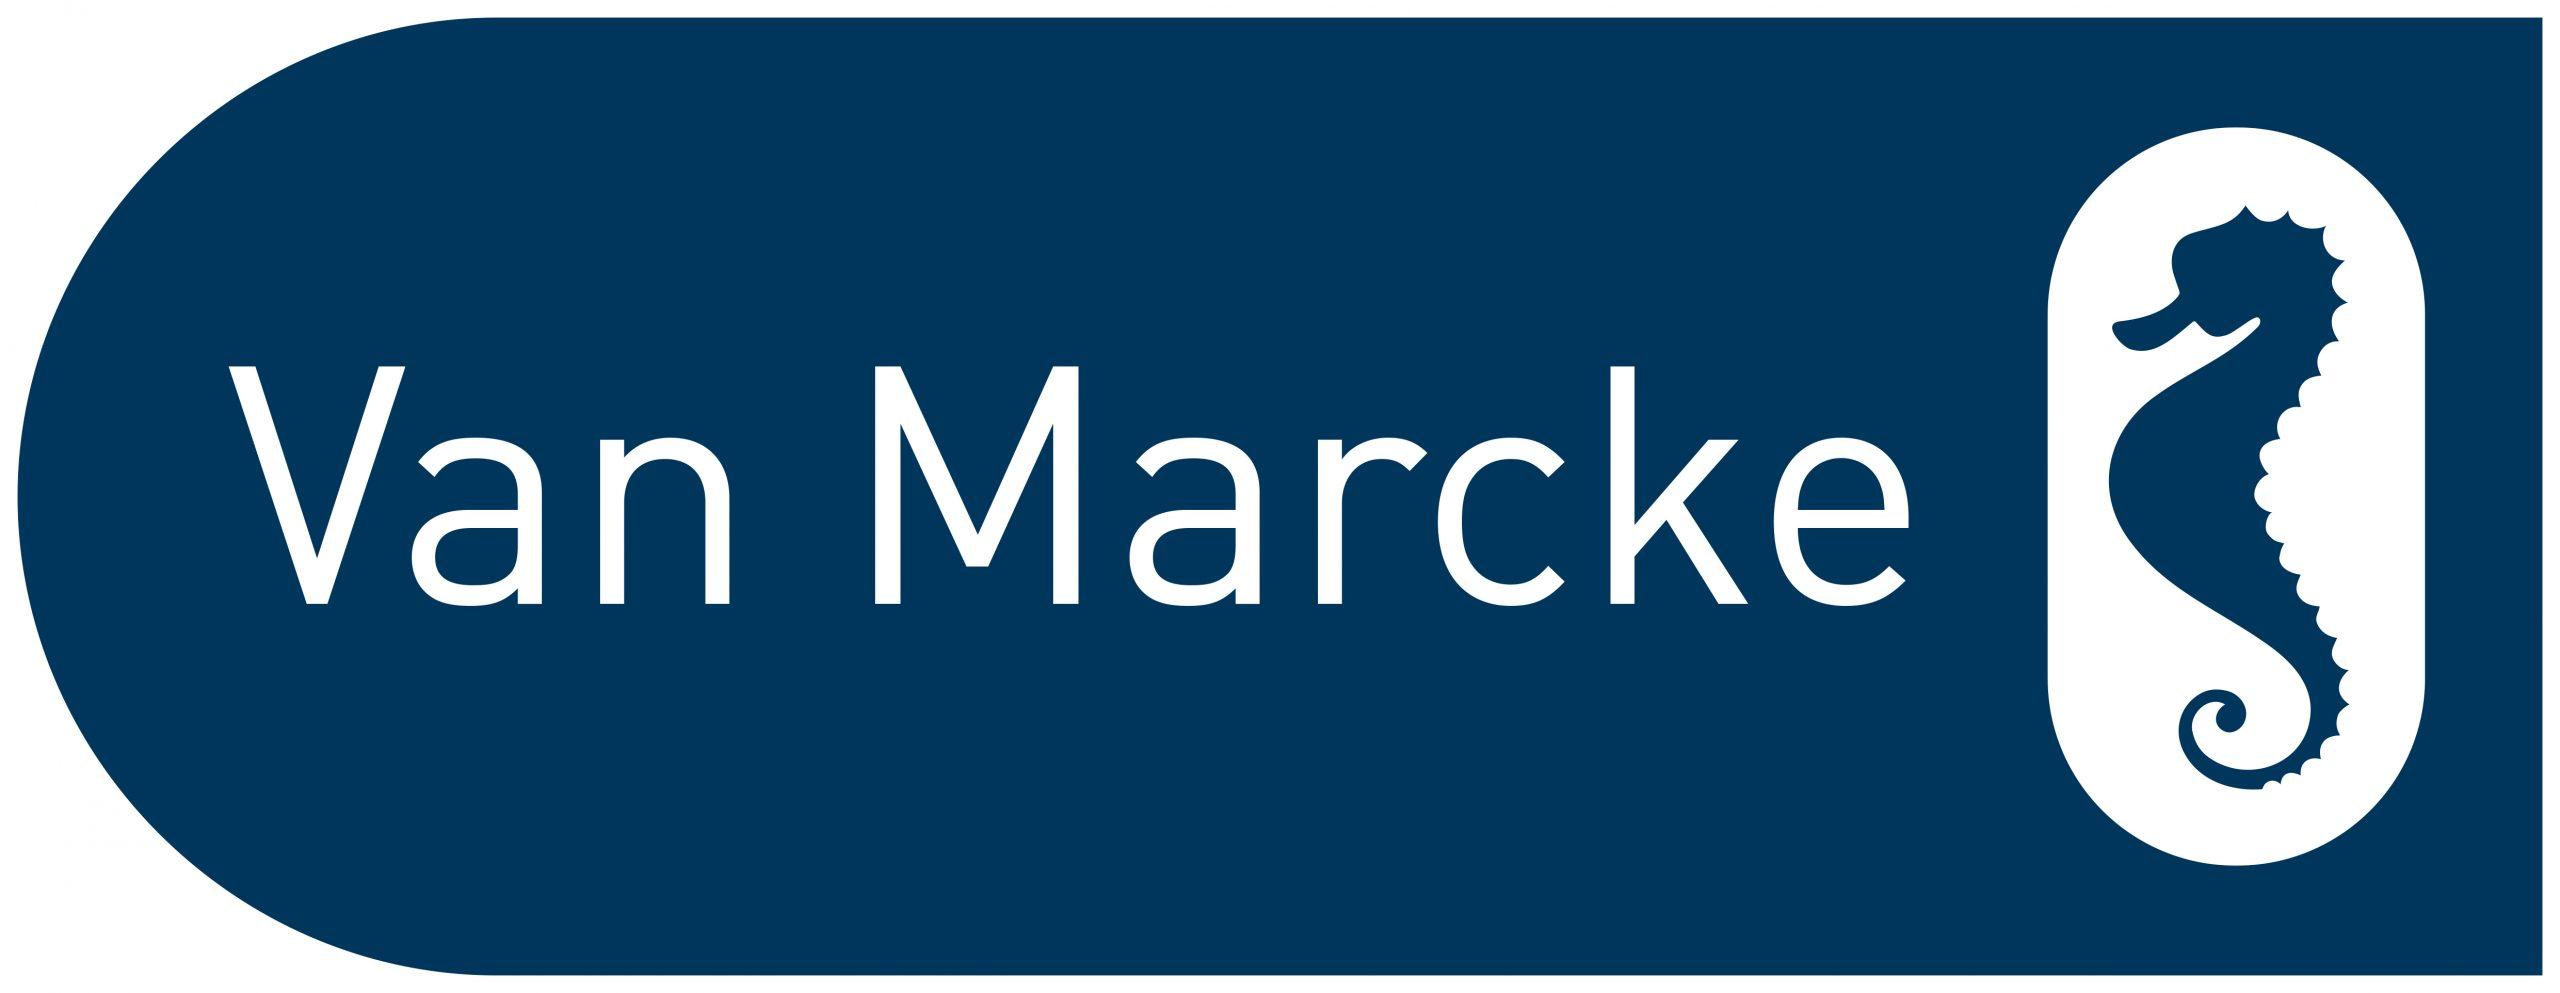 Van Marcke